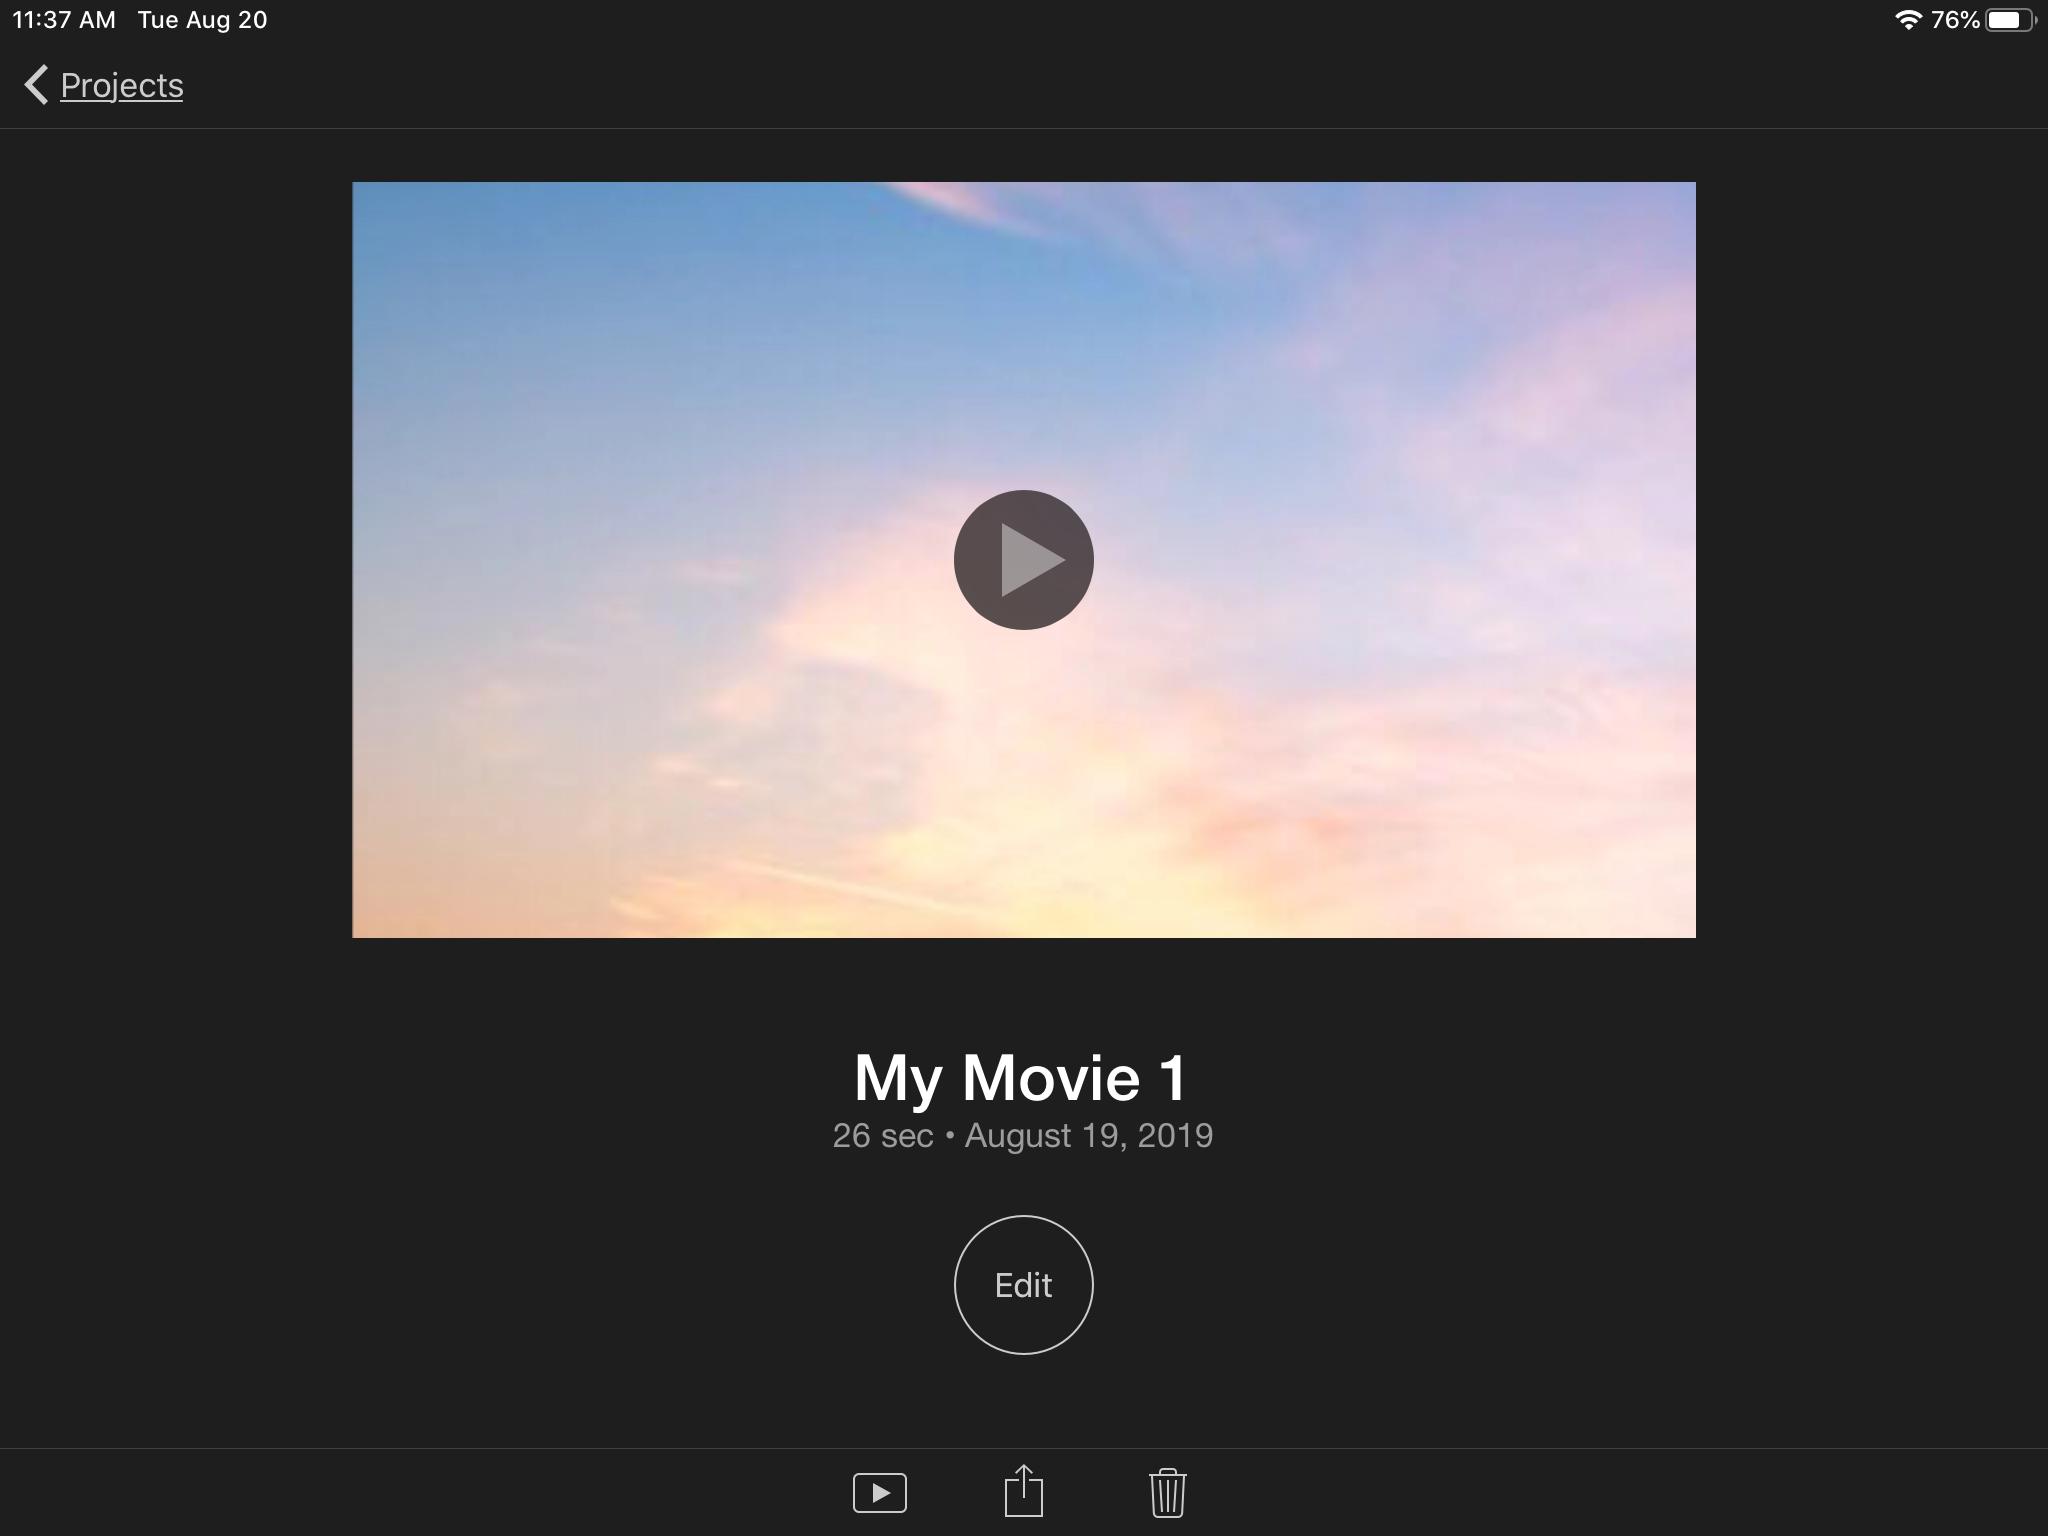 IPad iMovie project actions